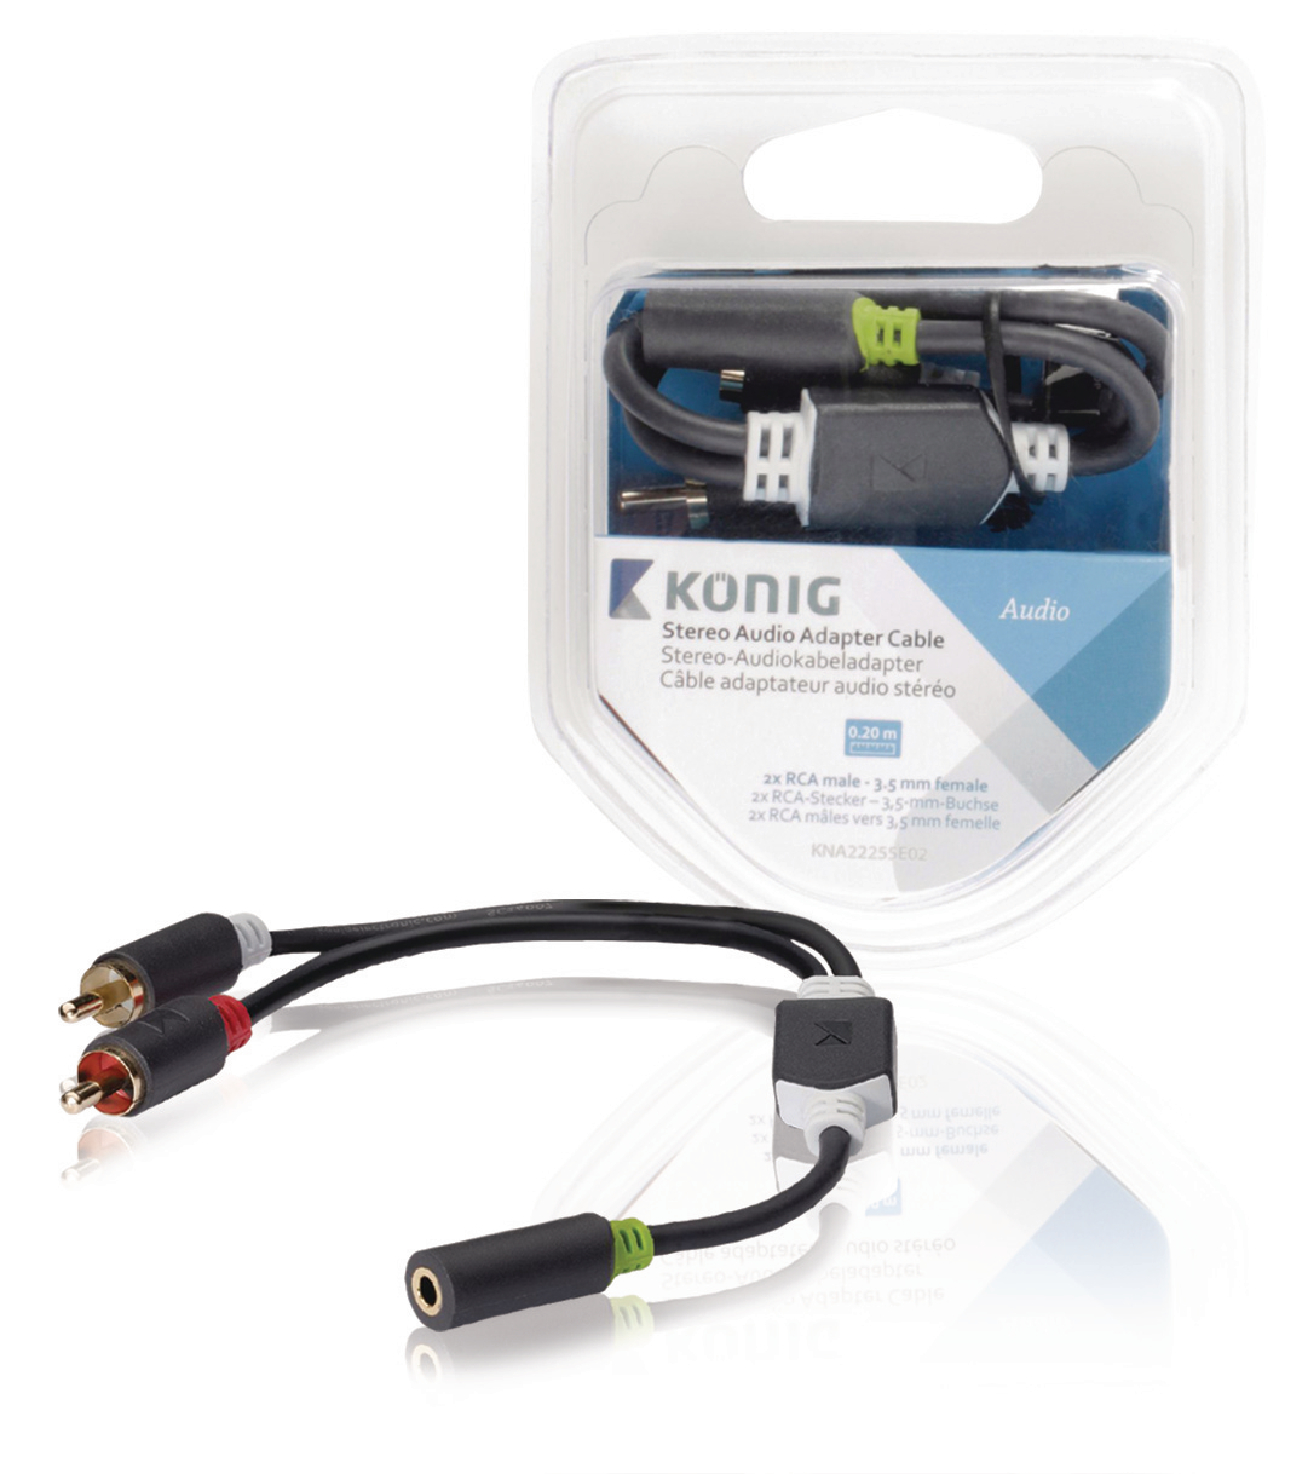 König König propojovací audio kabel zásuvka 3.5mm - 2x cinch zástrčka 0.2 m KNA22255E02